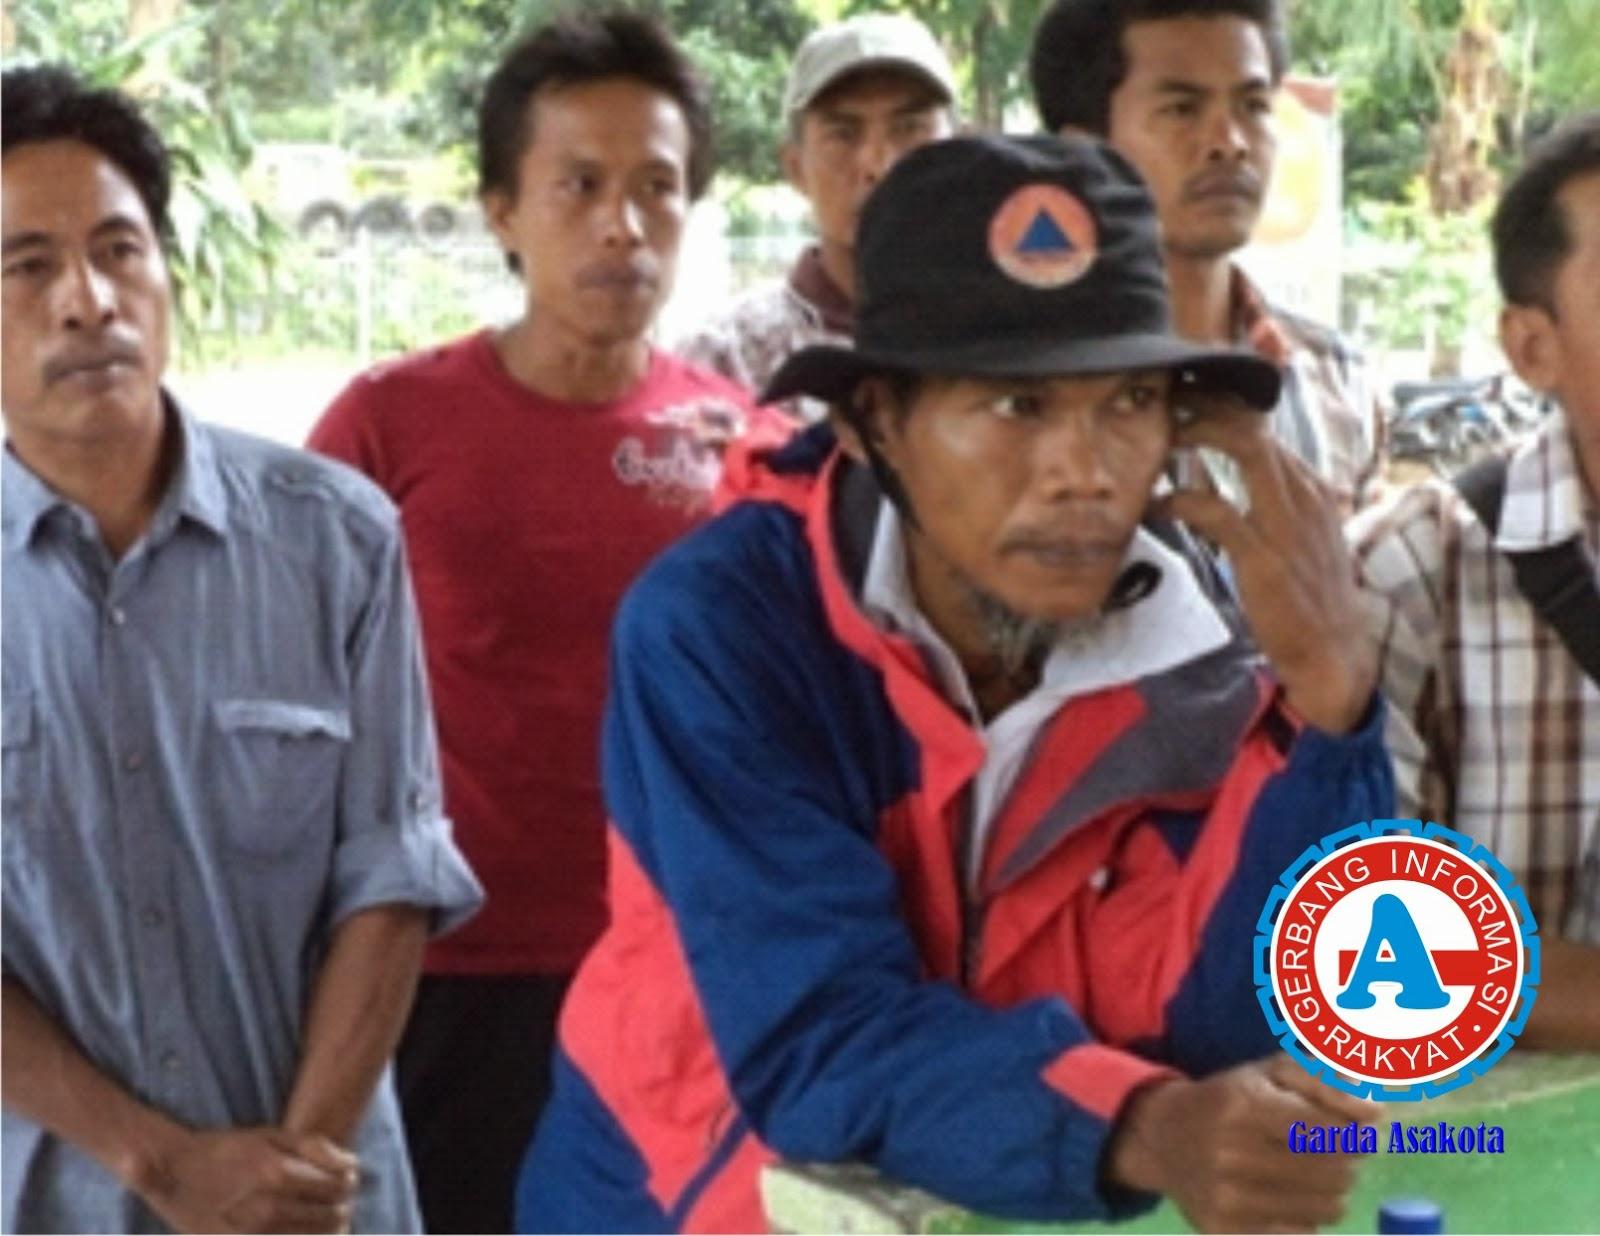 Forum Masyarakat Kawasan Tambora (FMKT) Audiensi Bersama Pihak PT. AWB